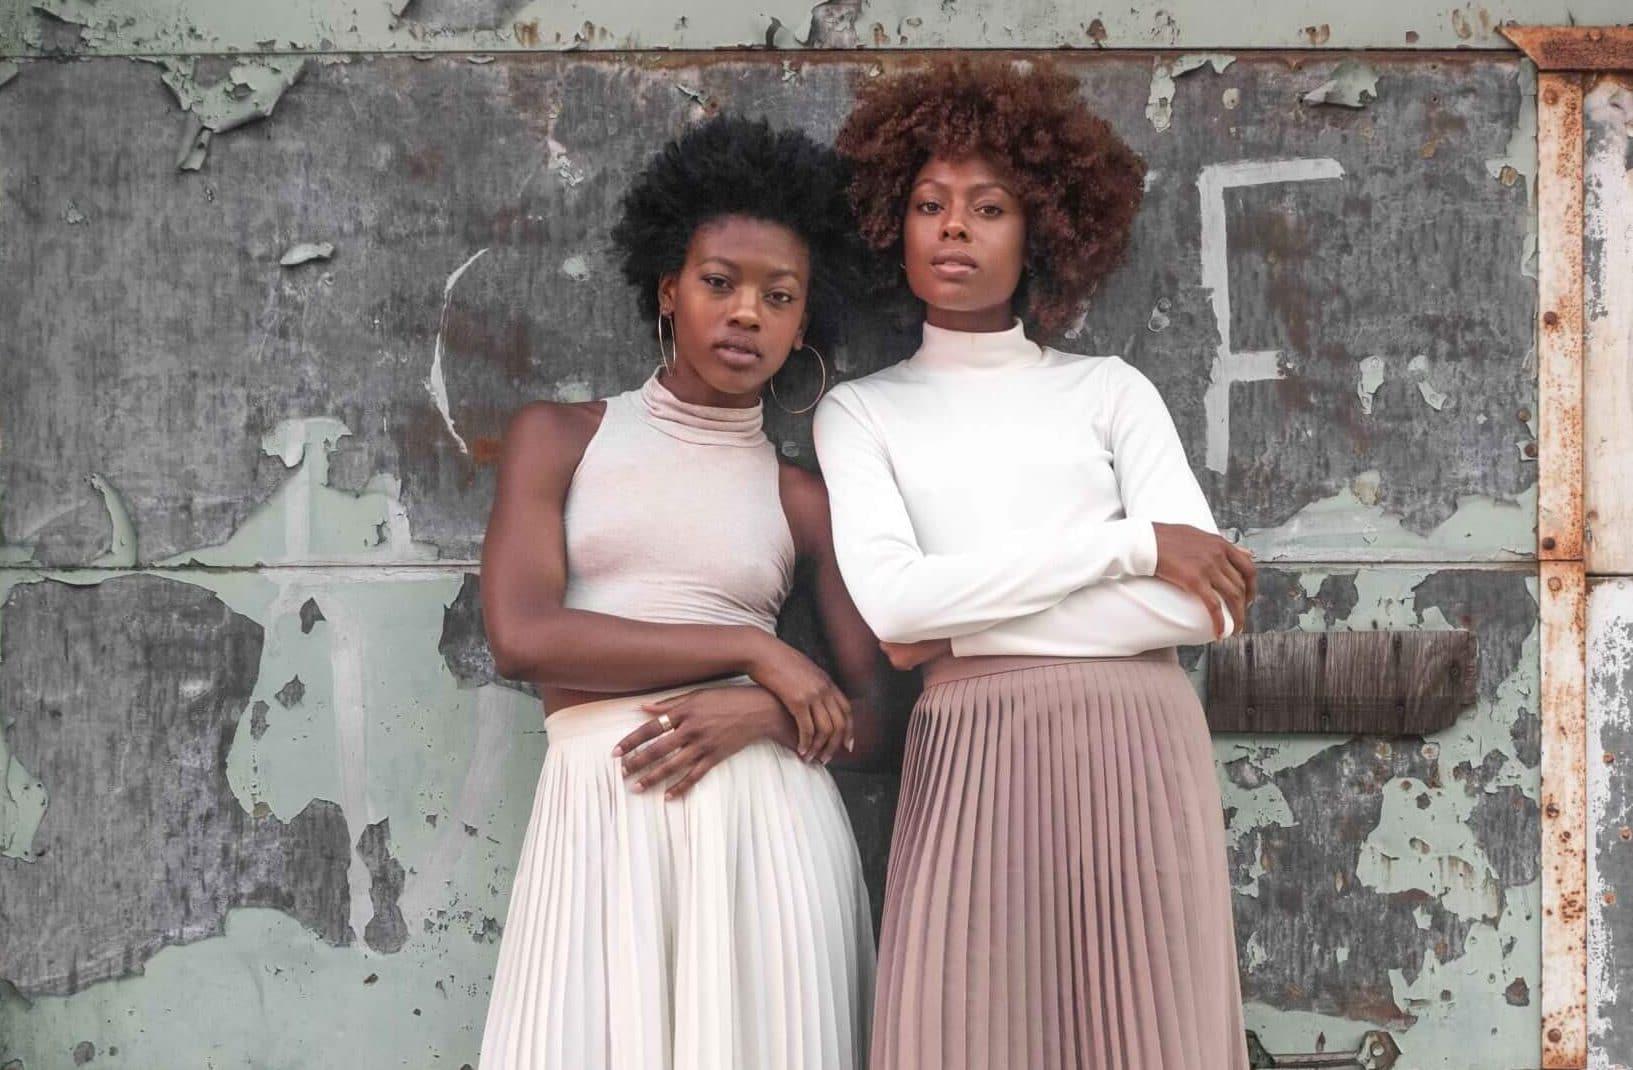 Black women standing together